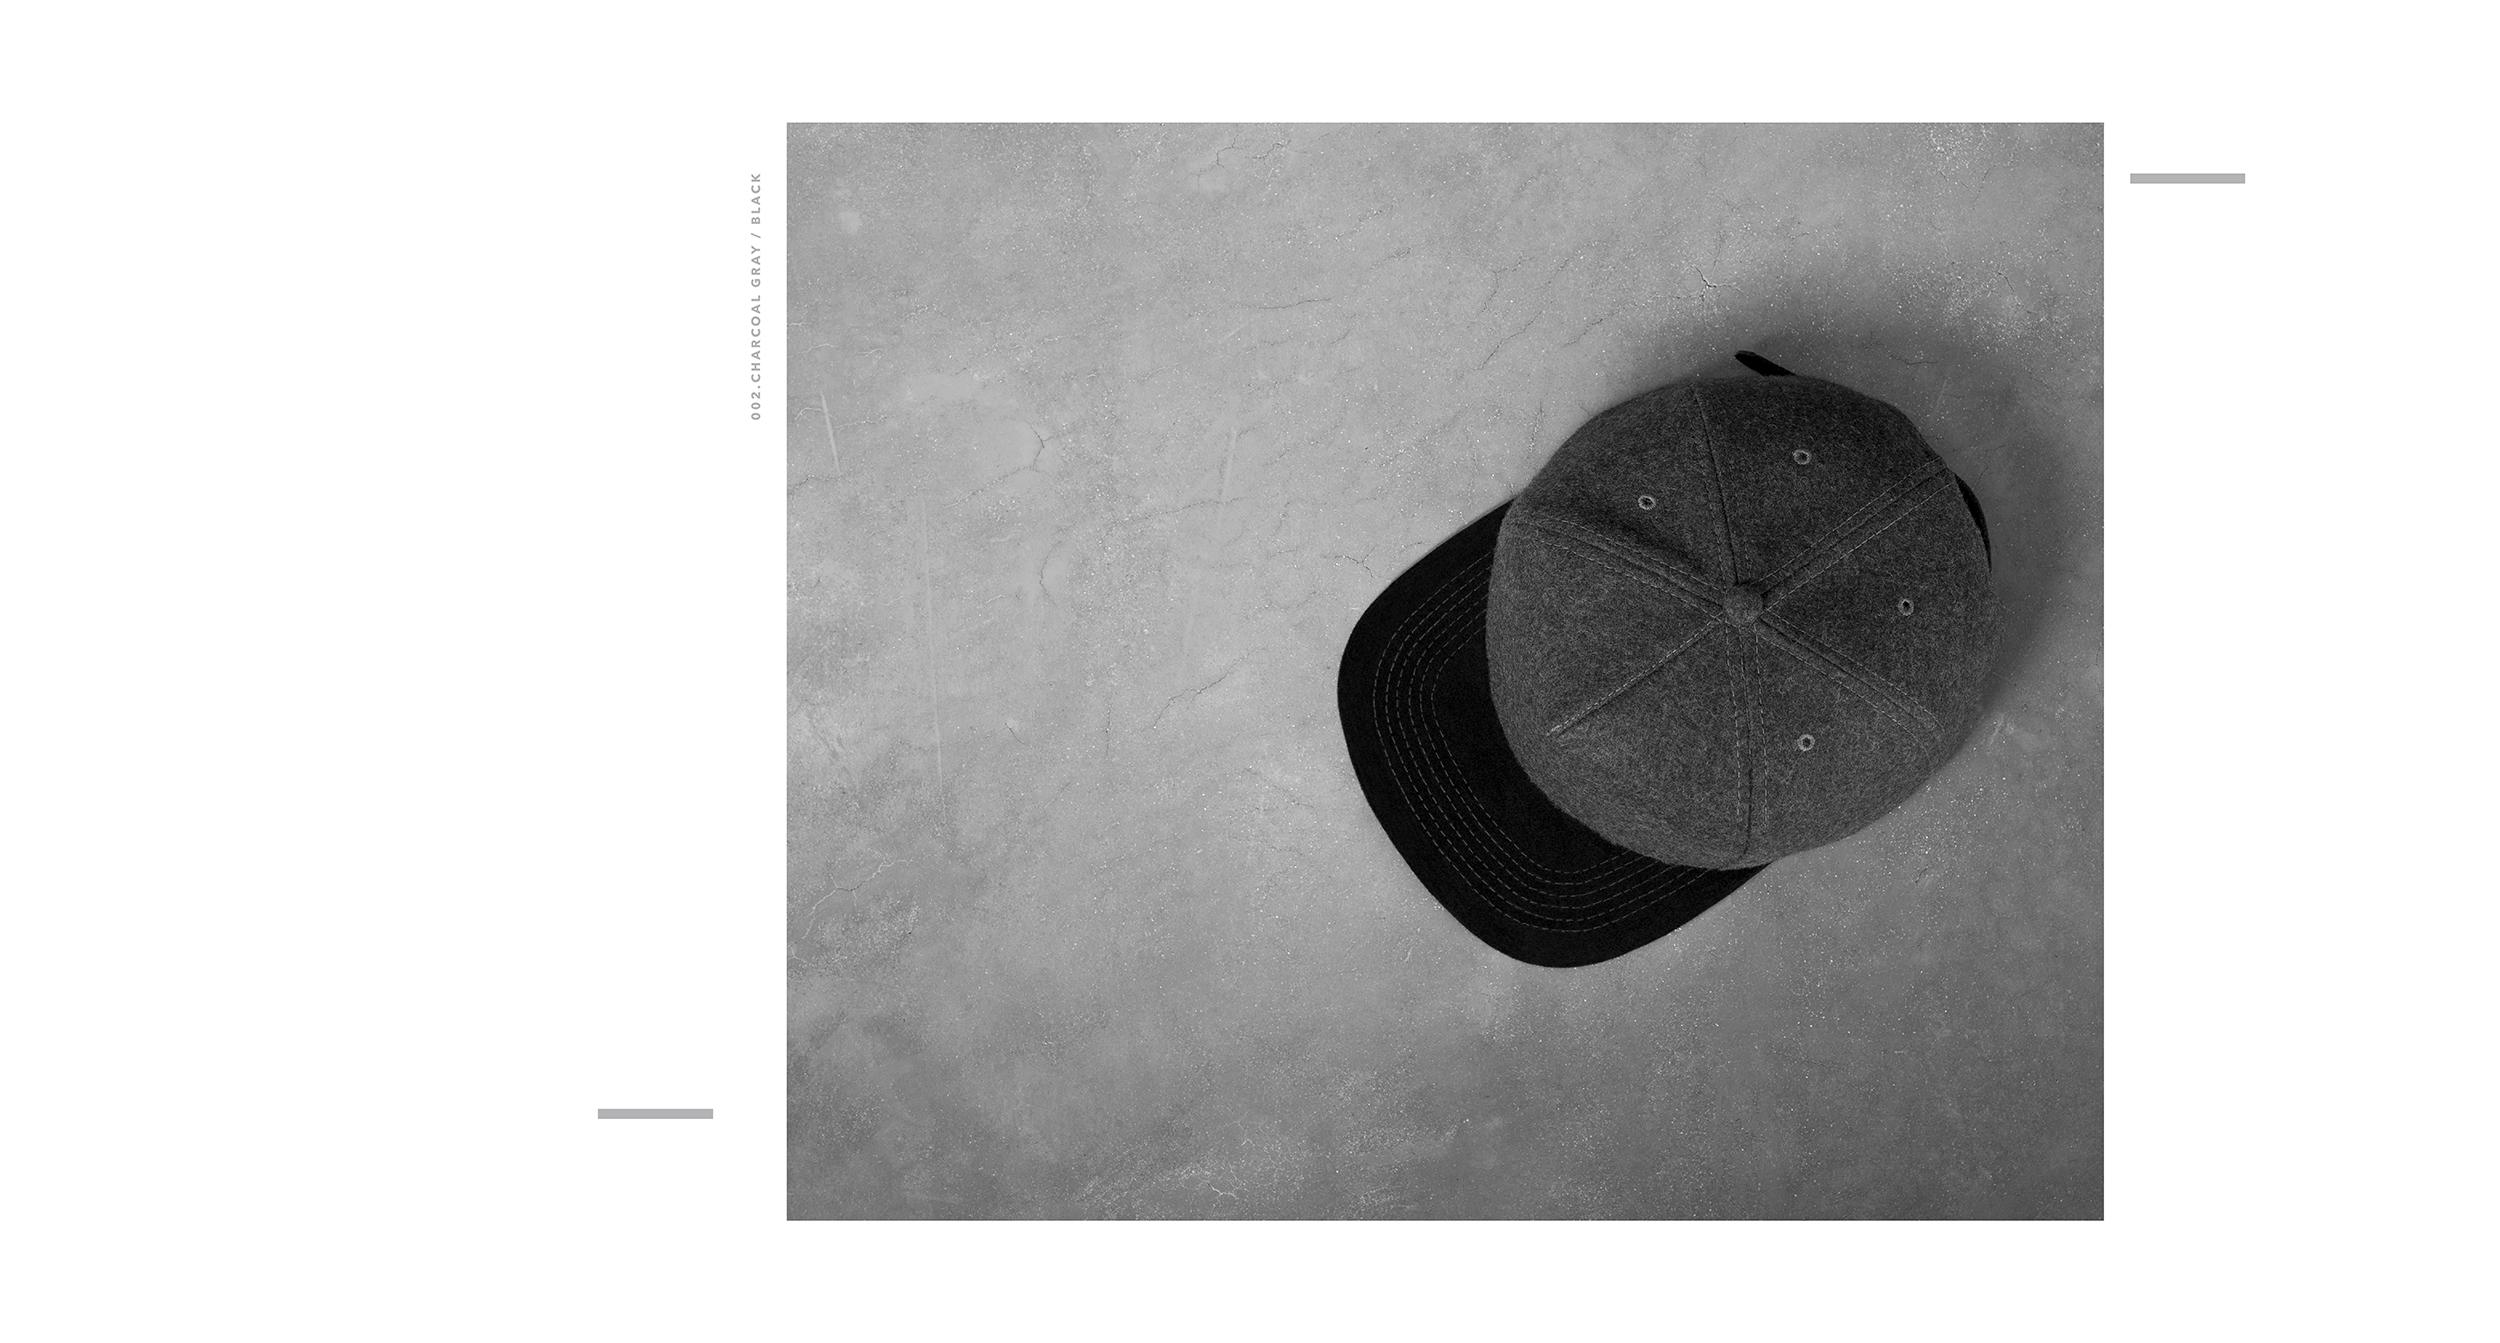 002.lookbook.charcoal_gray.black.jpg